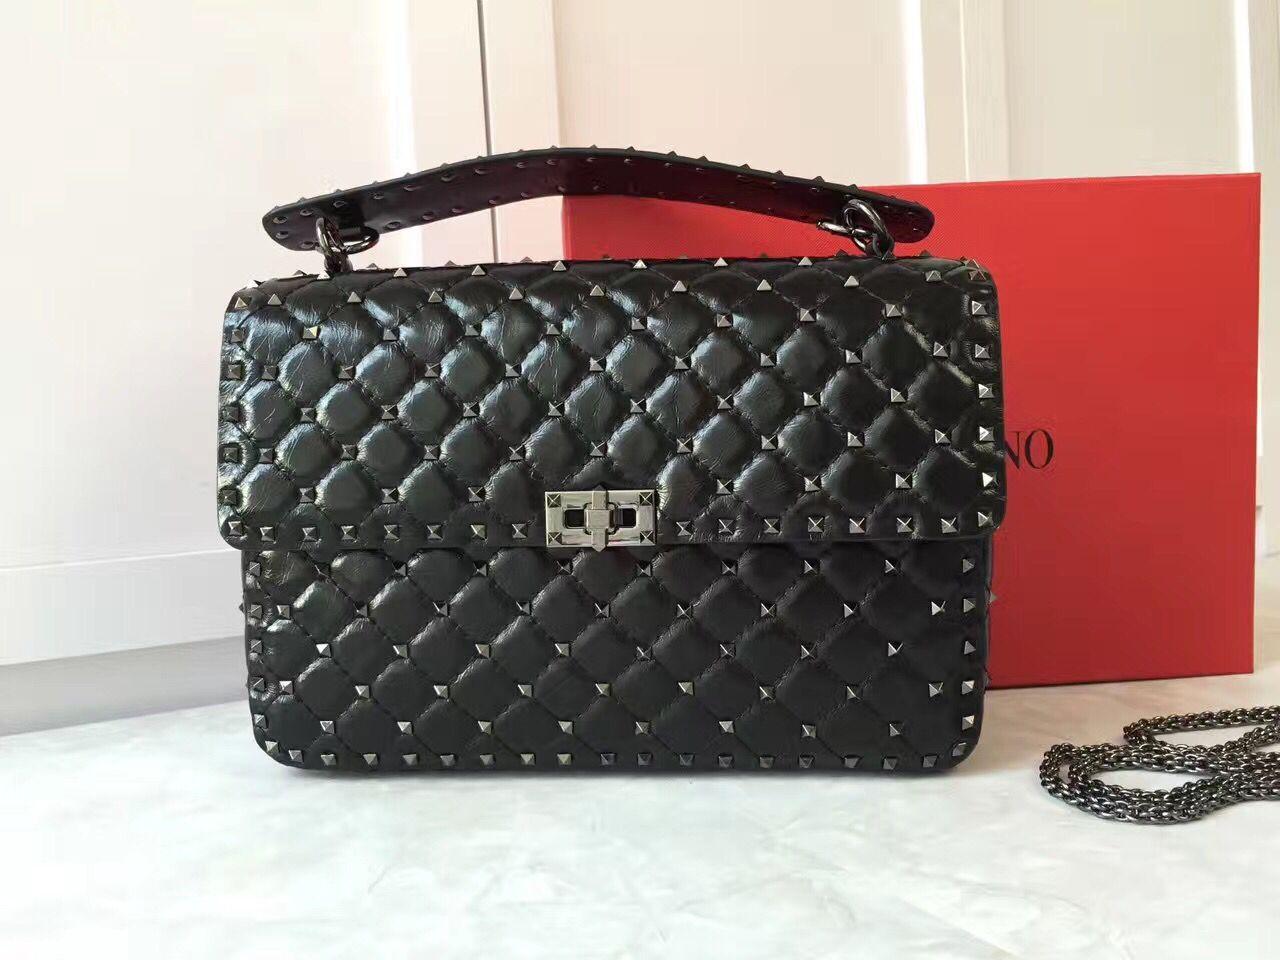 VALENTINO Spike quilted leather large shoulder bag A0327 black